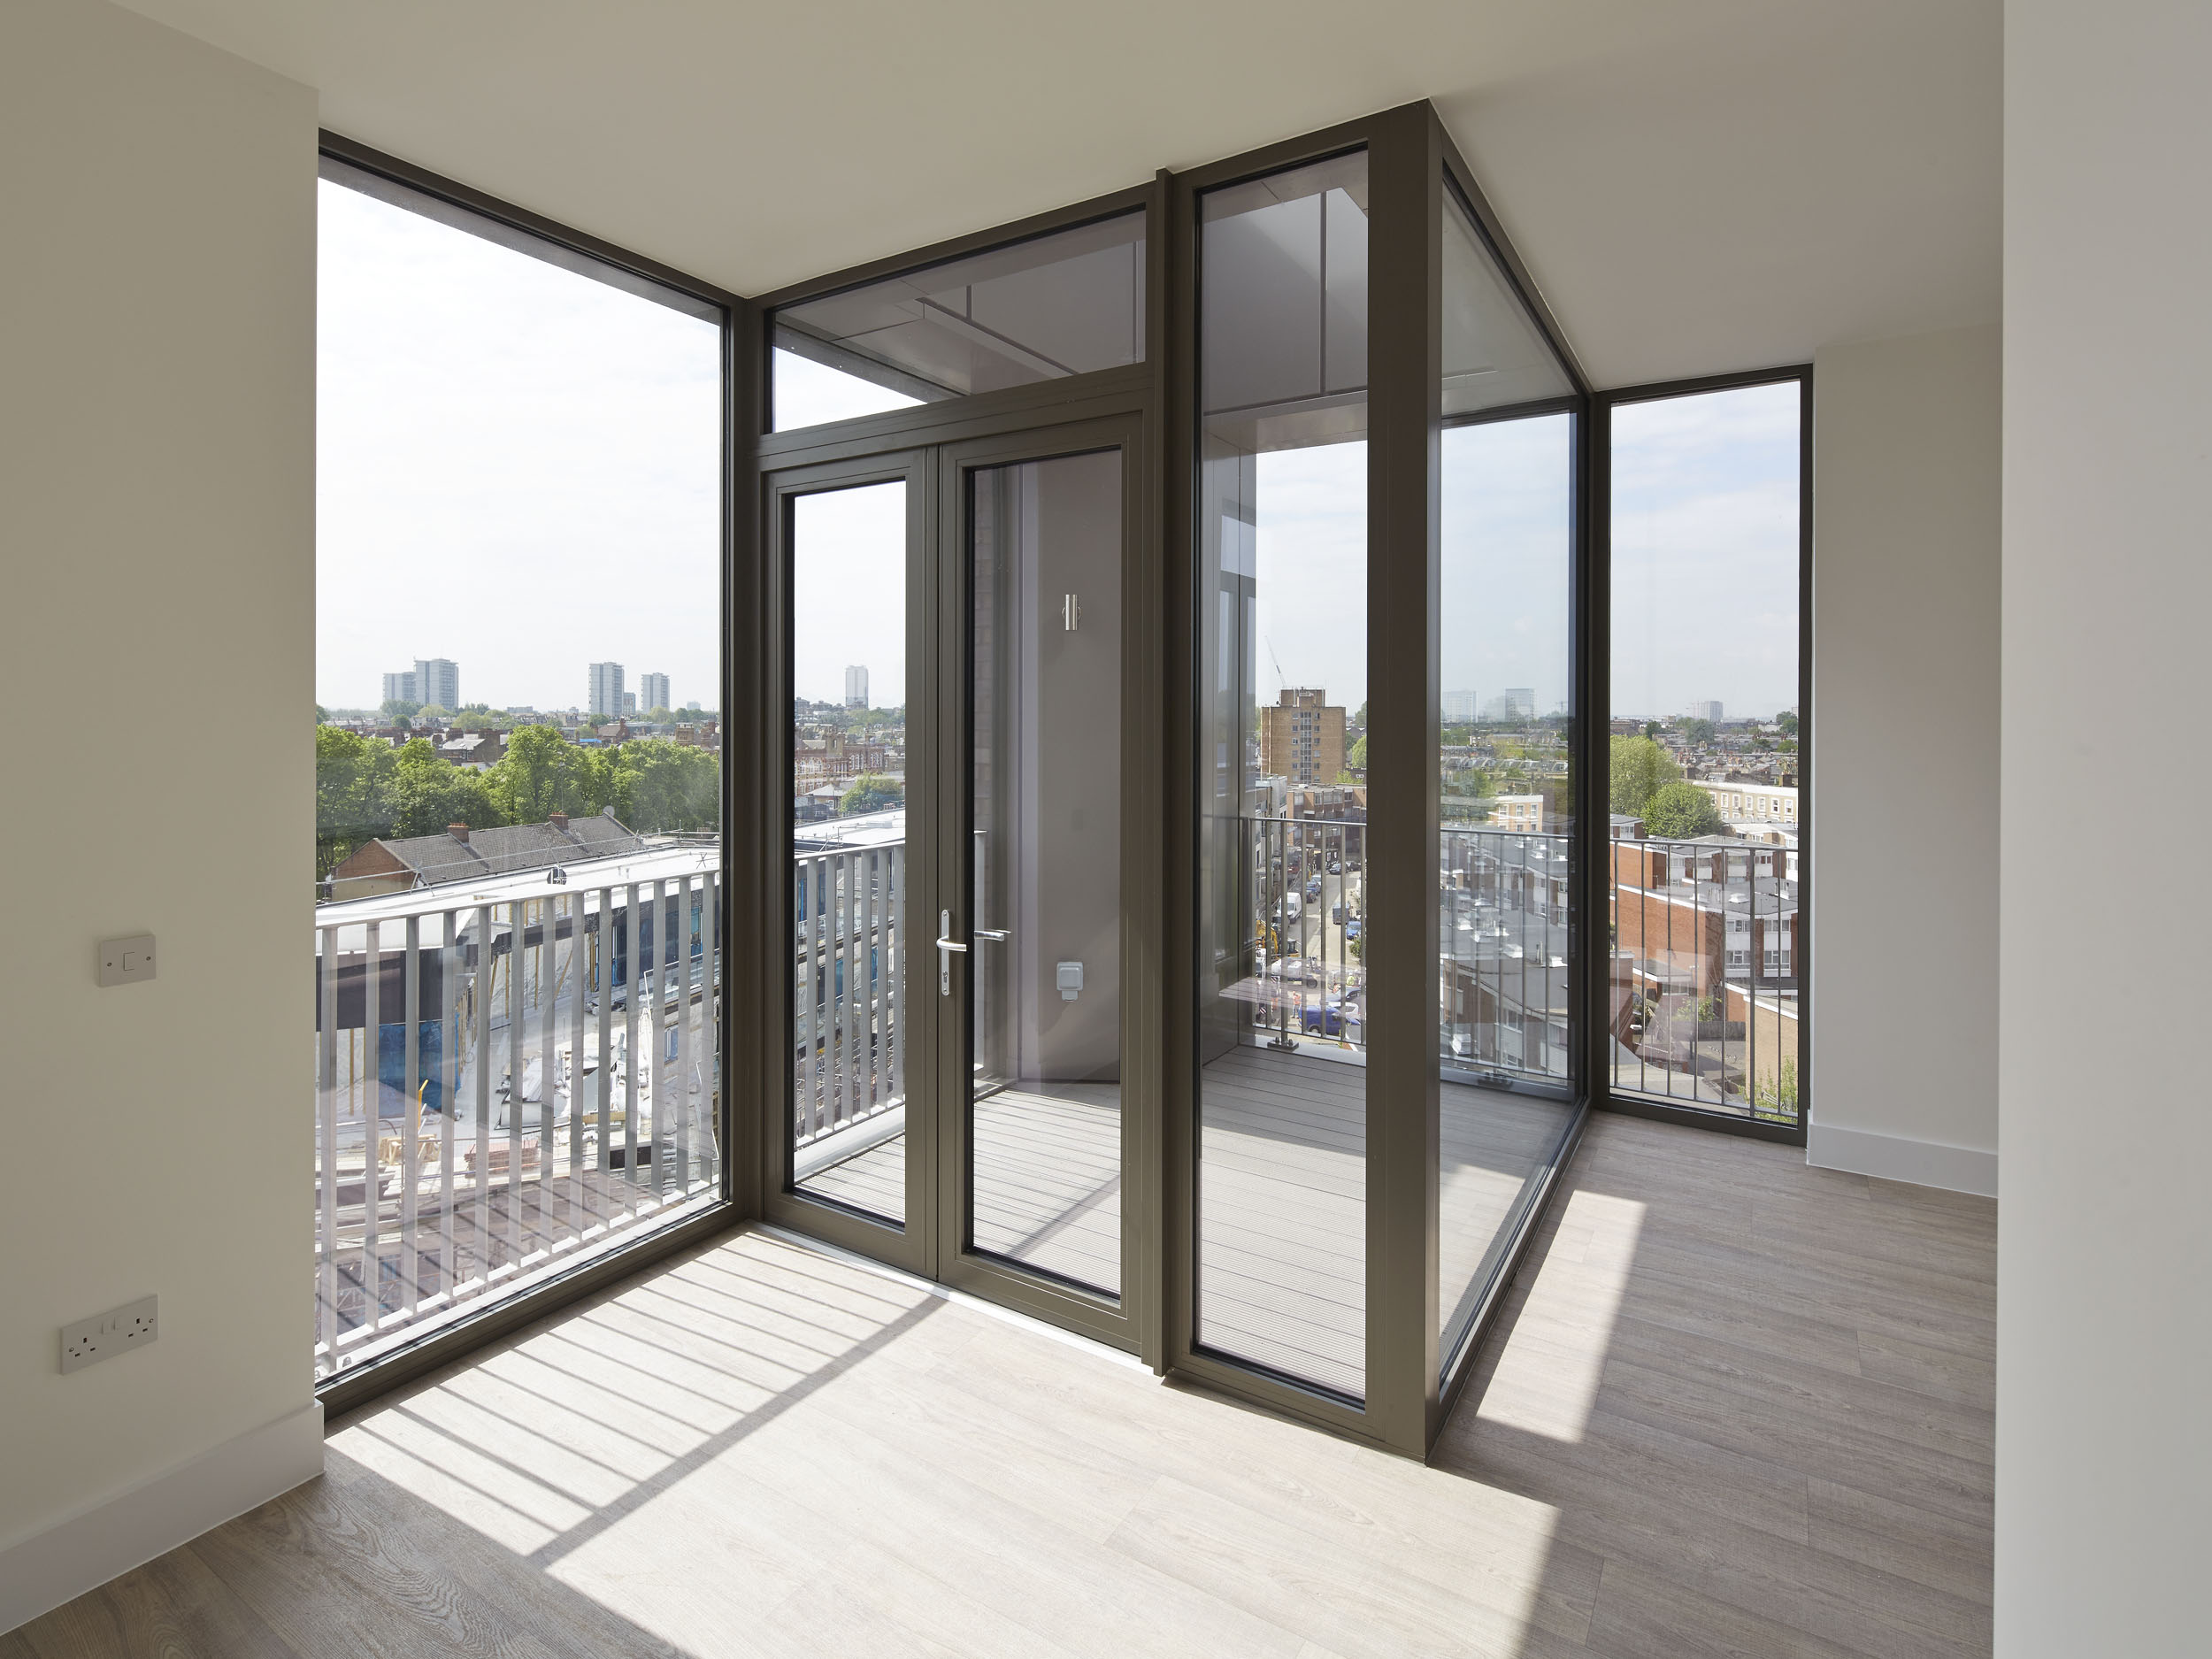 New photos reveal south kilburn interiors alison brooks for Balcony interior